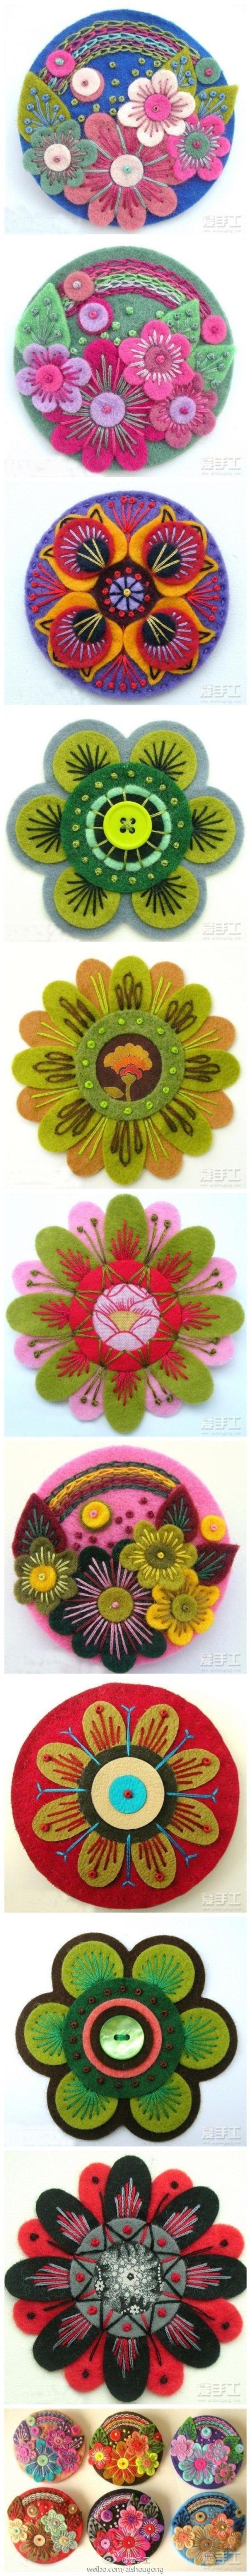 very cute designs